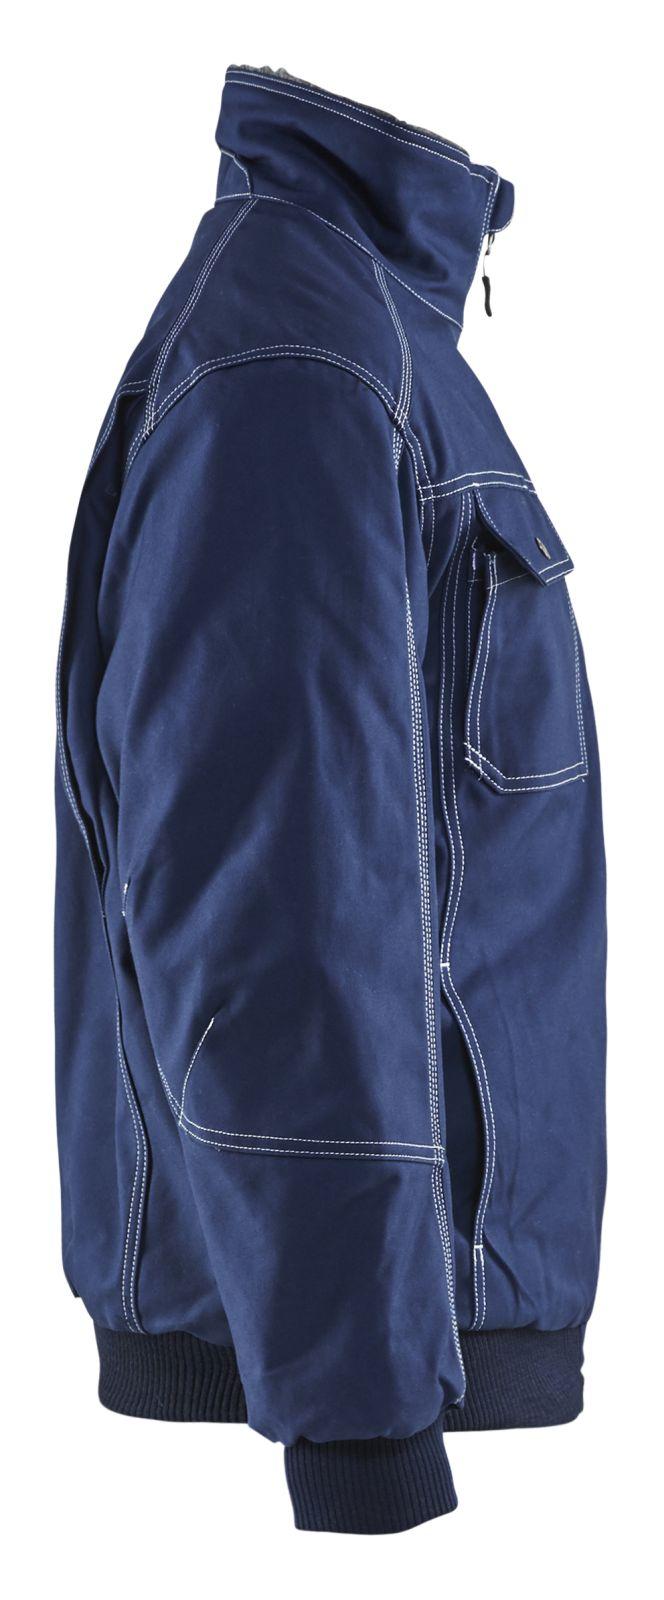 Blaklader Pilot jacks 49161370 marineblauw(8800)